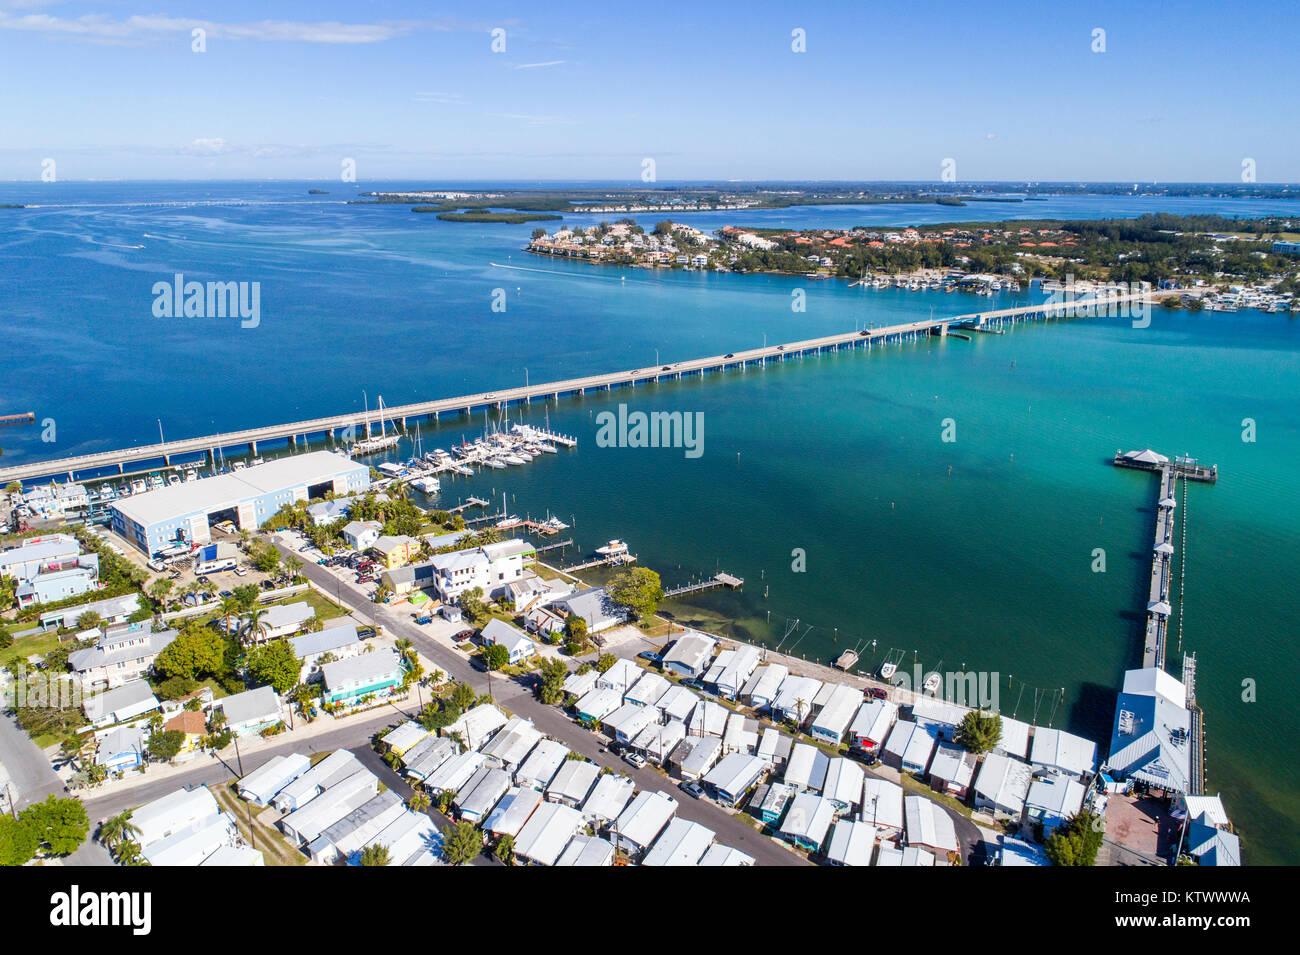 Florida Bradenton Beach Pier Anna Maria Sound Sarasota Bay Estuarine System Cortez Road Bridge aerial overhead view - Stock Image